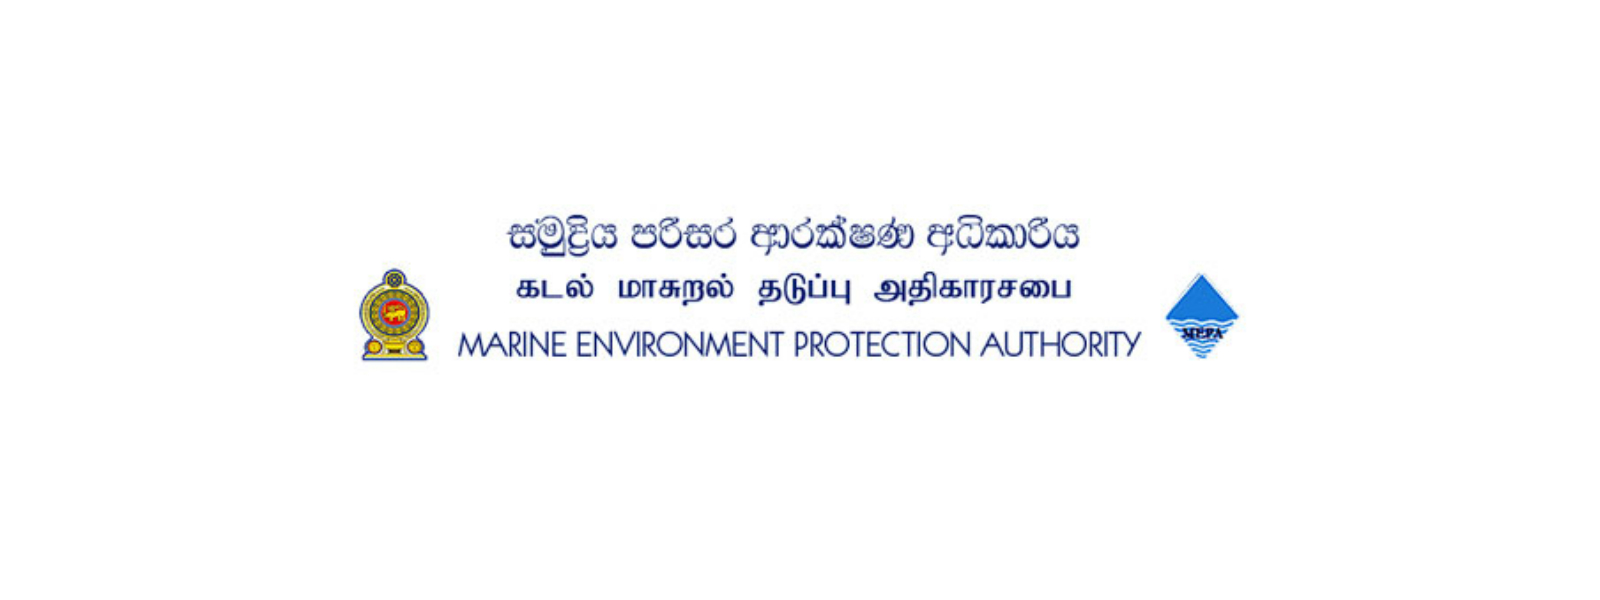 MEPA to monitor plastic usage of fishing trawlers